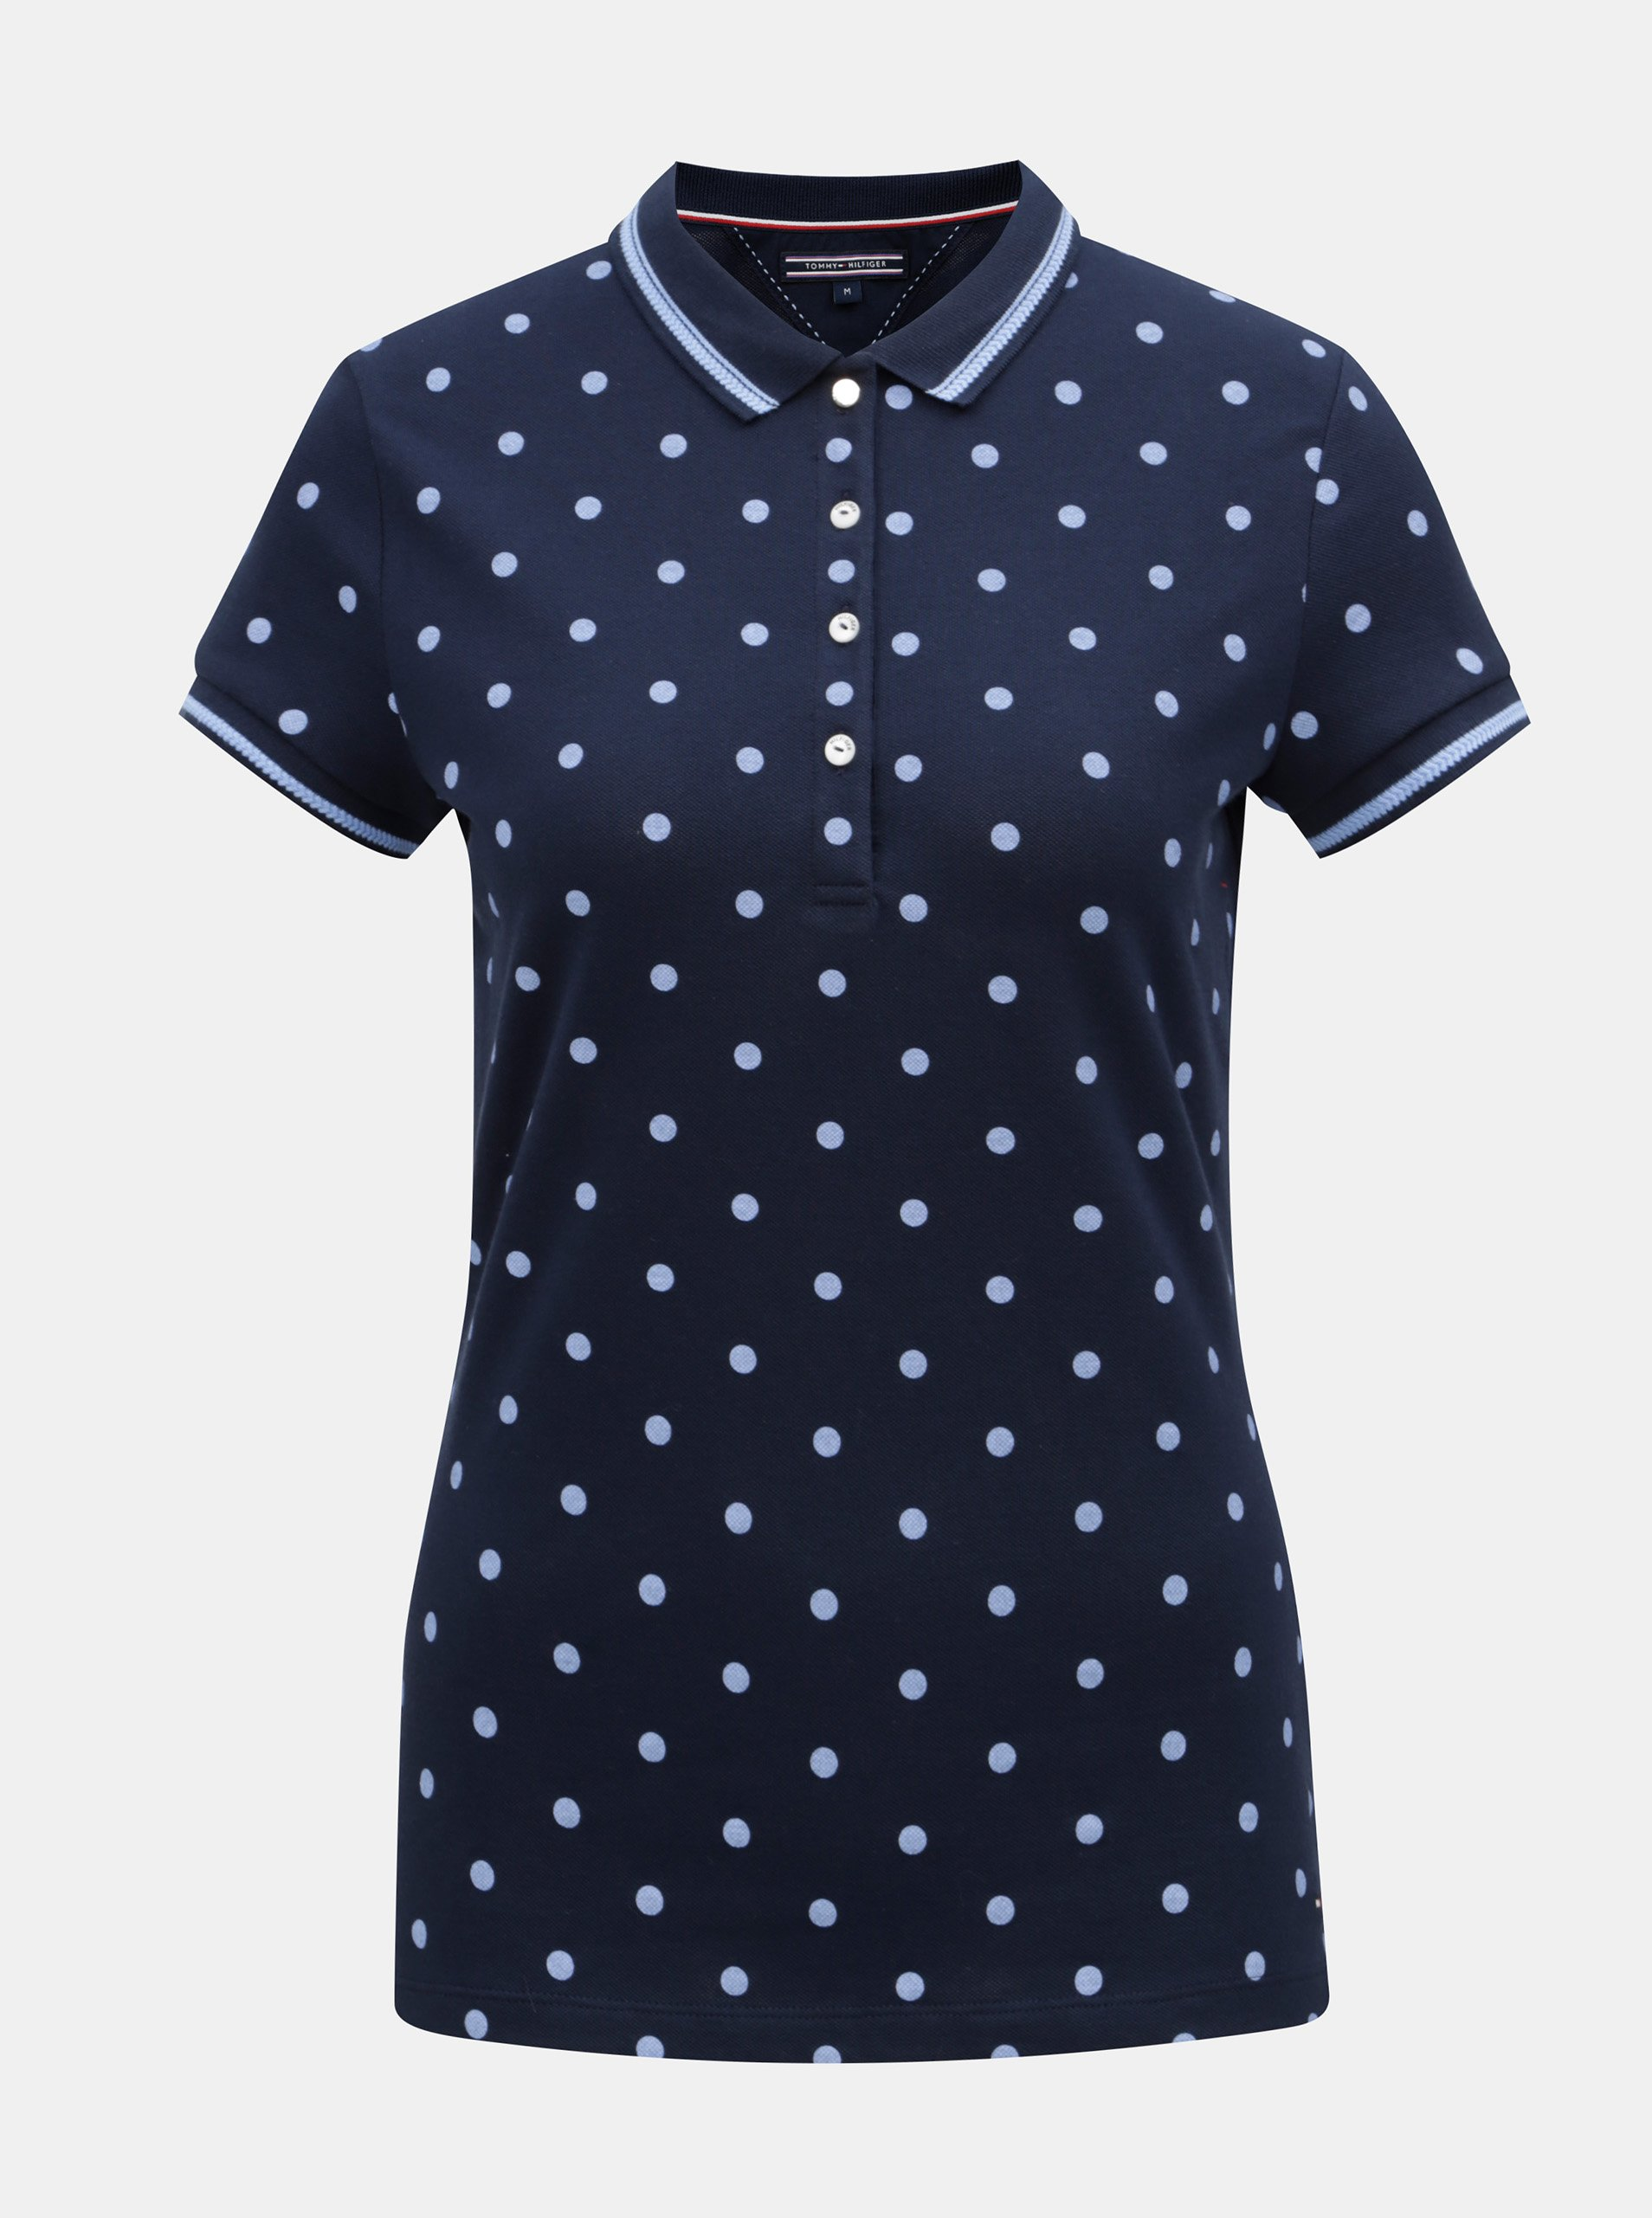 Modré dámské vzorované polo tričko Tommy Hilfiger